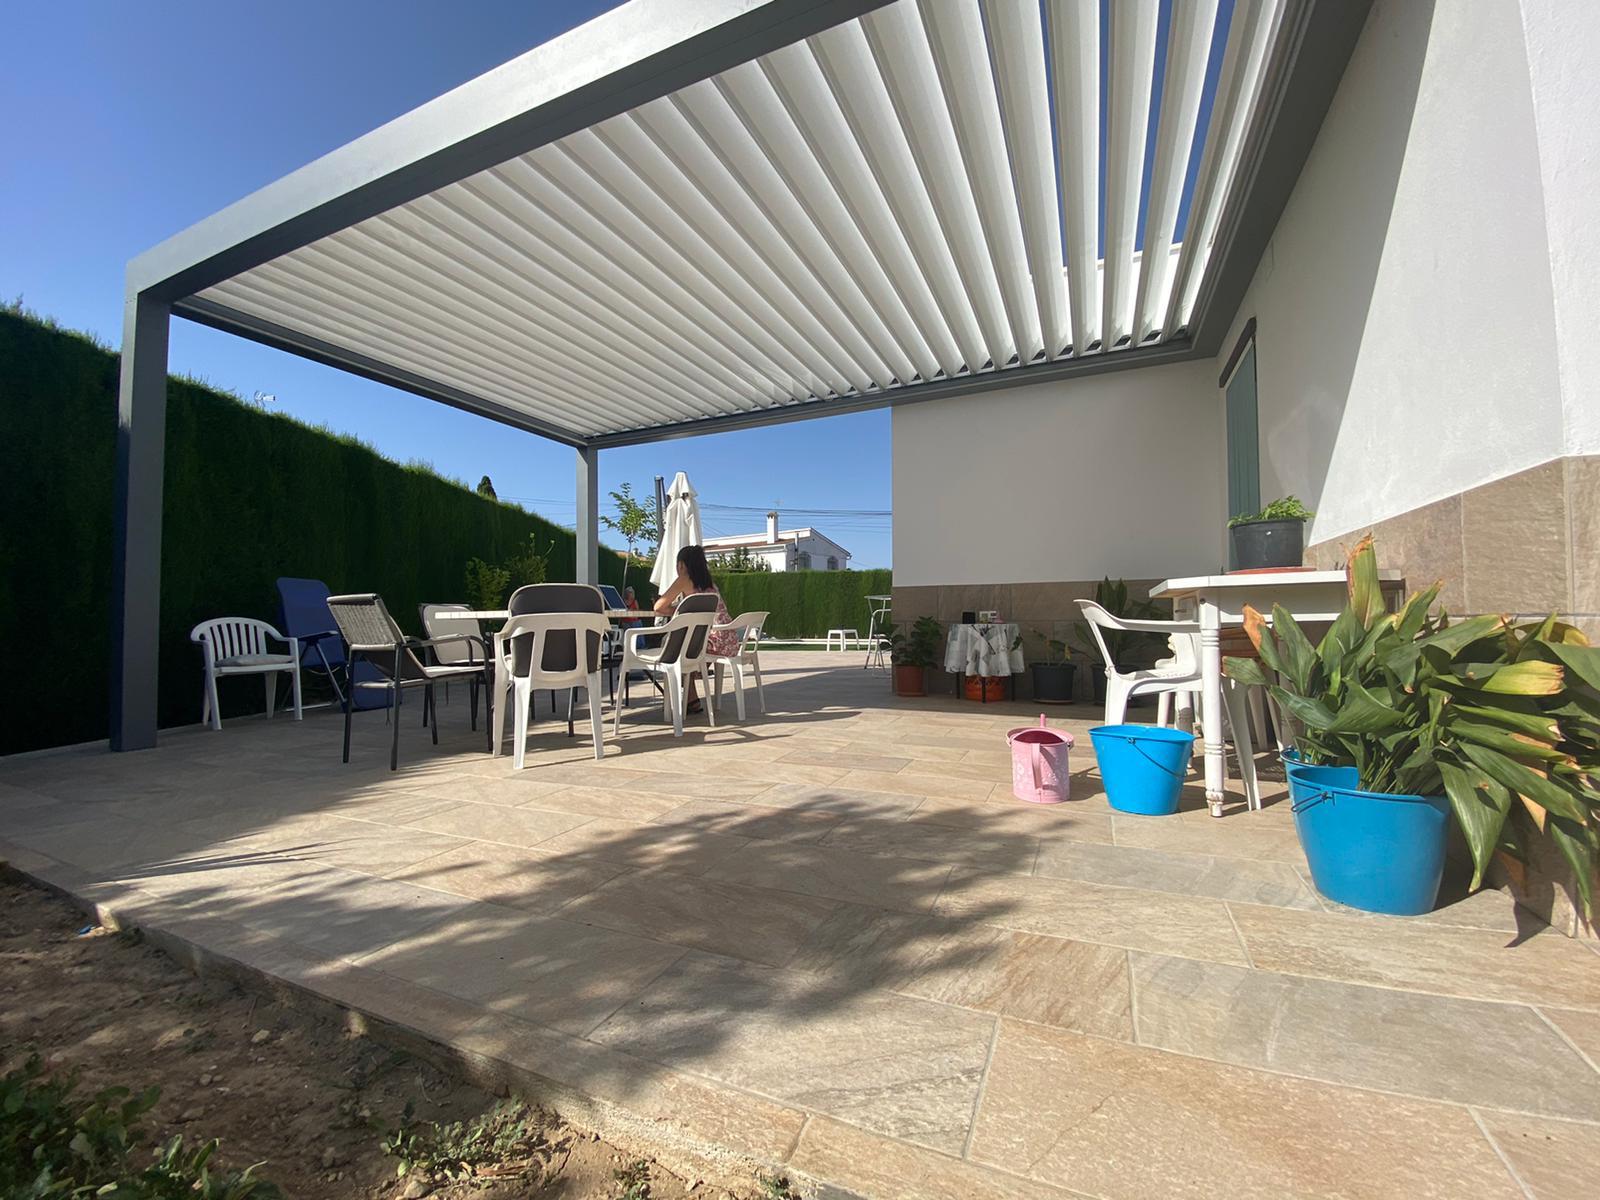 oficina-jardin-pergola-bioclimatica2